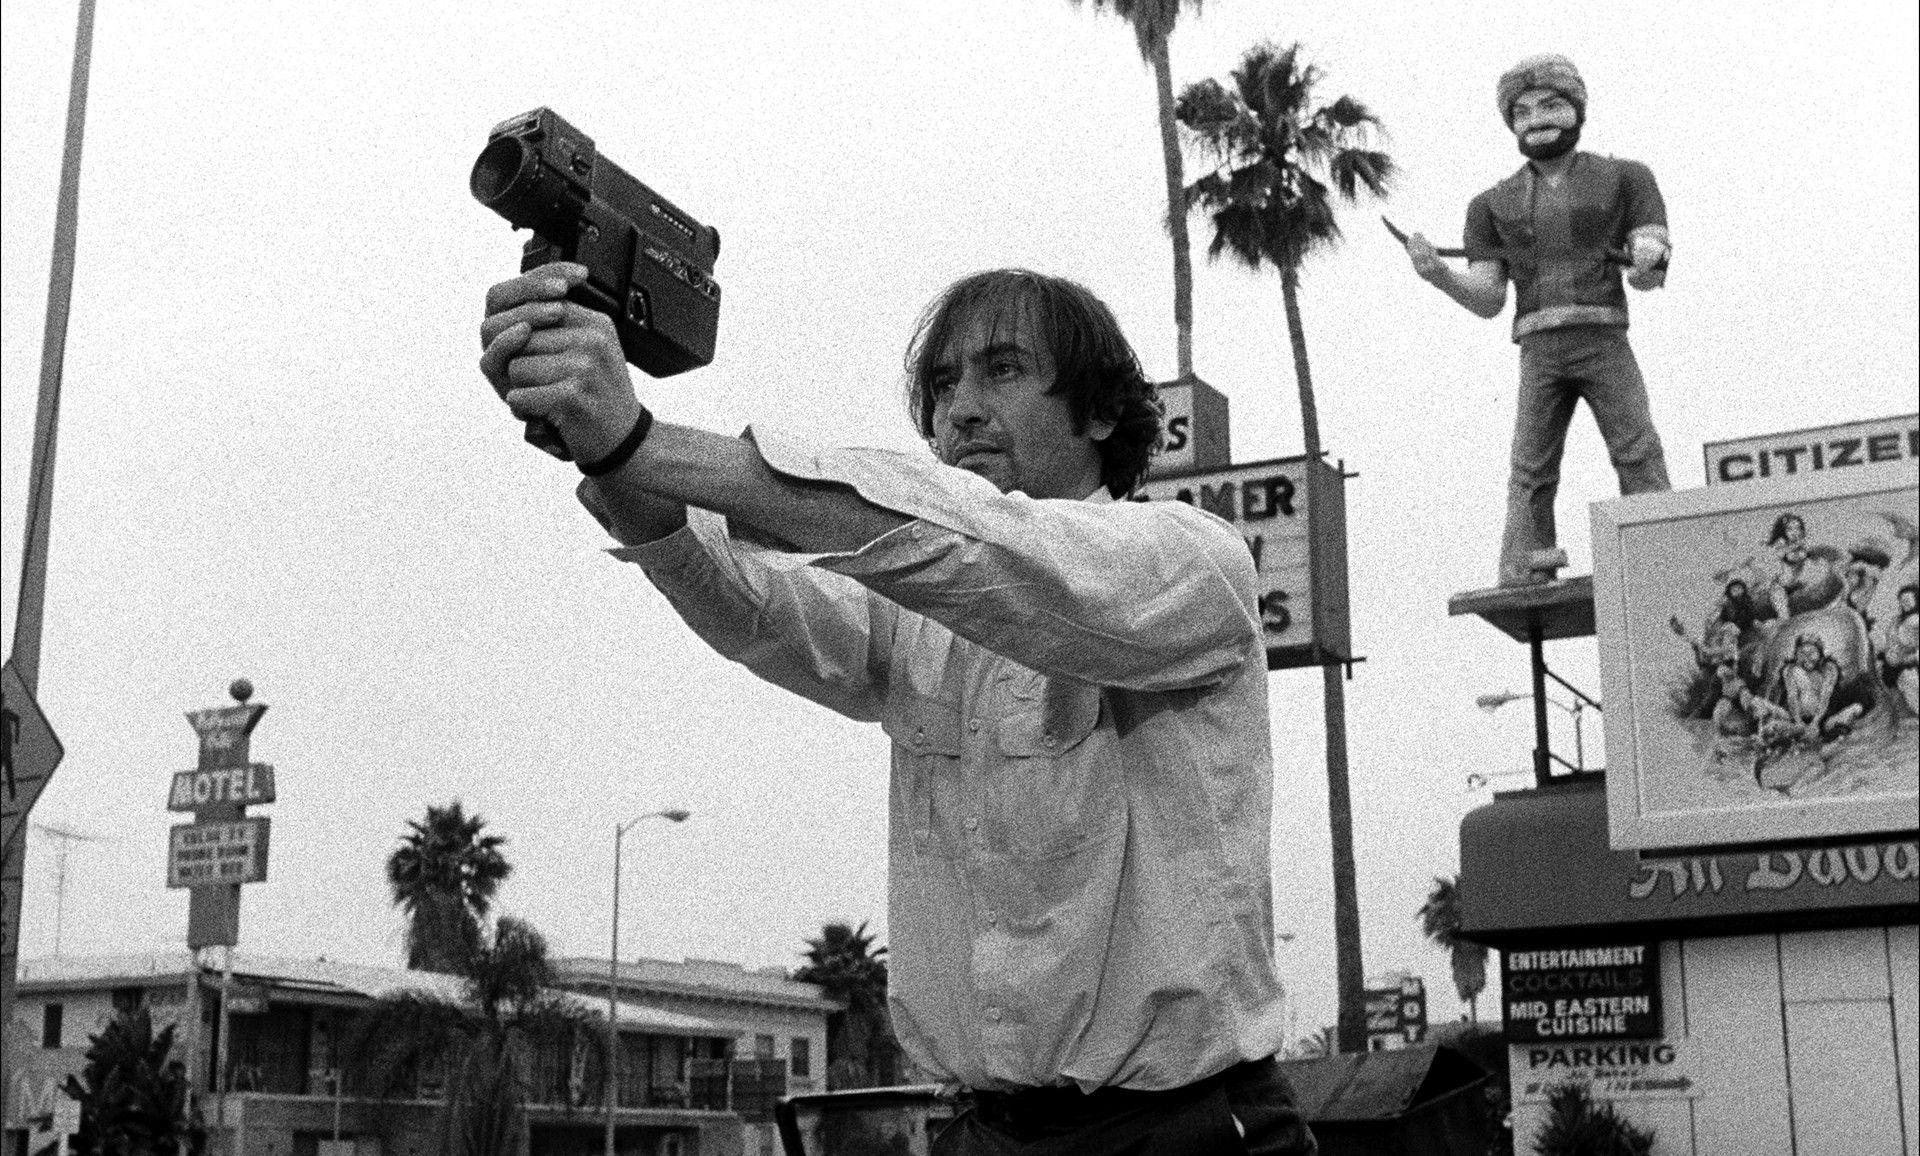 Quarentena Cinéfila. Cinco filmes, de Raúl Ruiz, Julien Faraut a Wim Wenders, para veres de forma gratuita